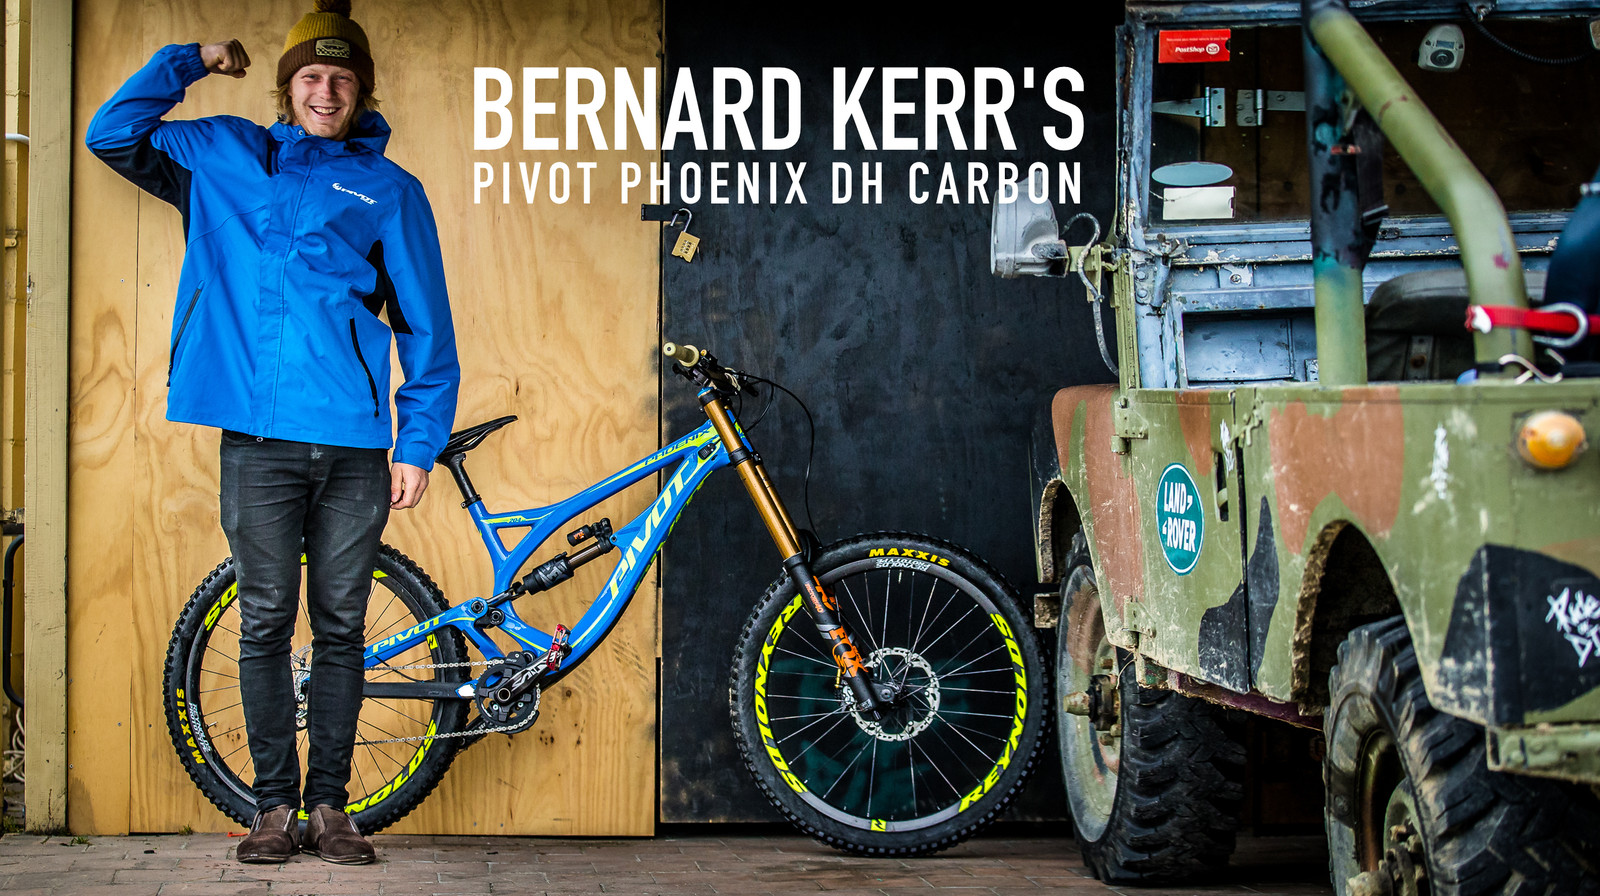 Bernard Kerr's Pivot Phoenix DH Carbon